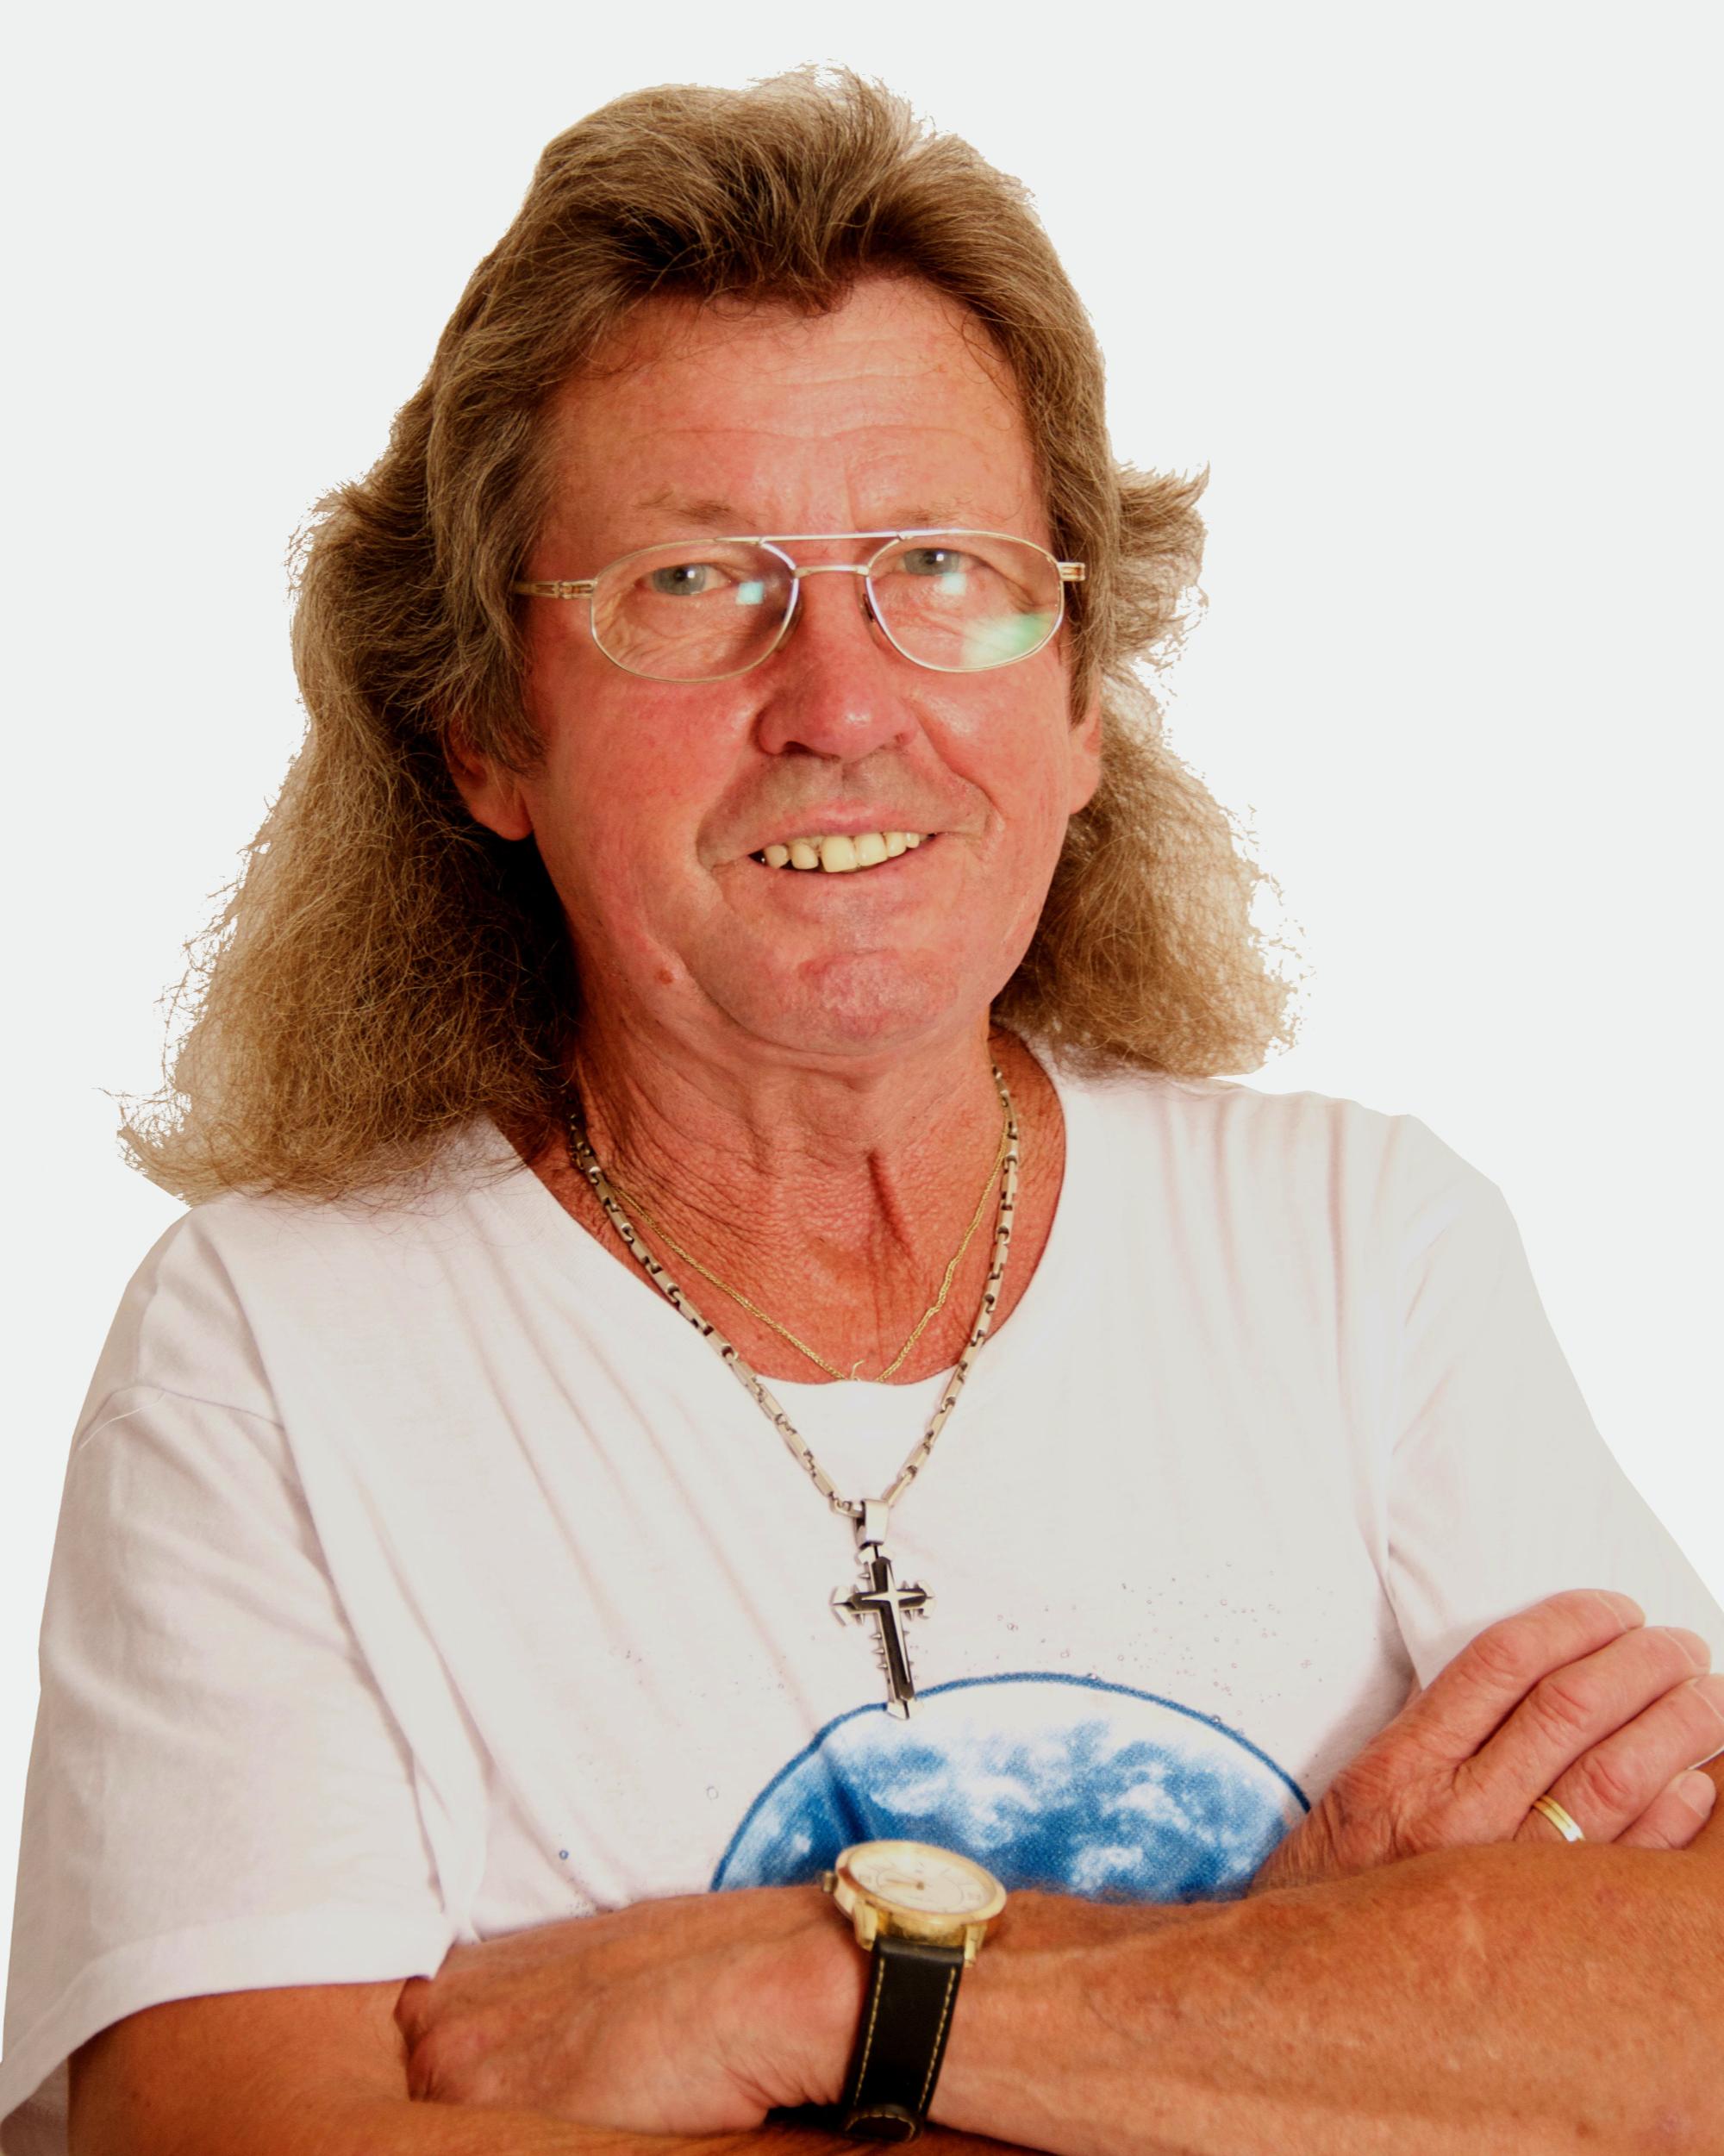 Walter Ringer